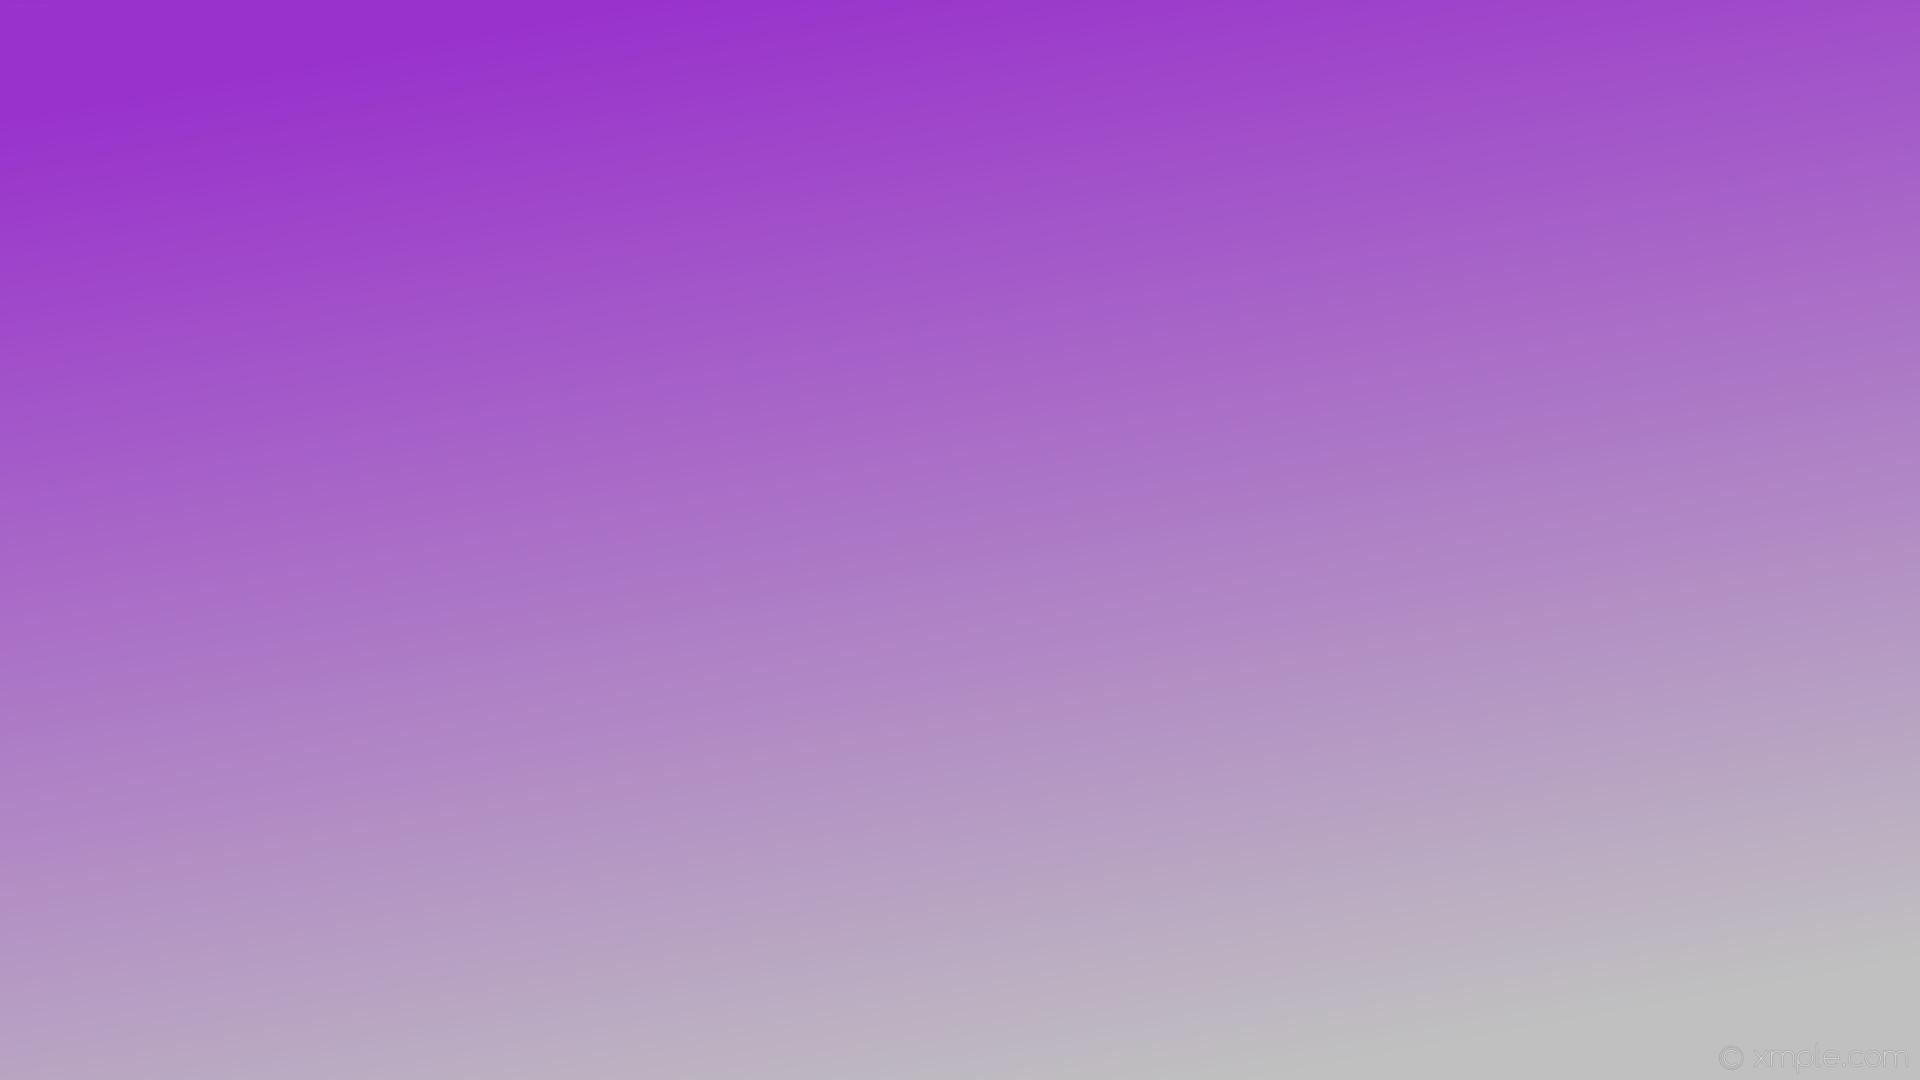 wallpaper gradient linear purple grey silver dark orchid #c0c0c0 #9932cc  300°